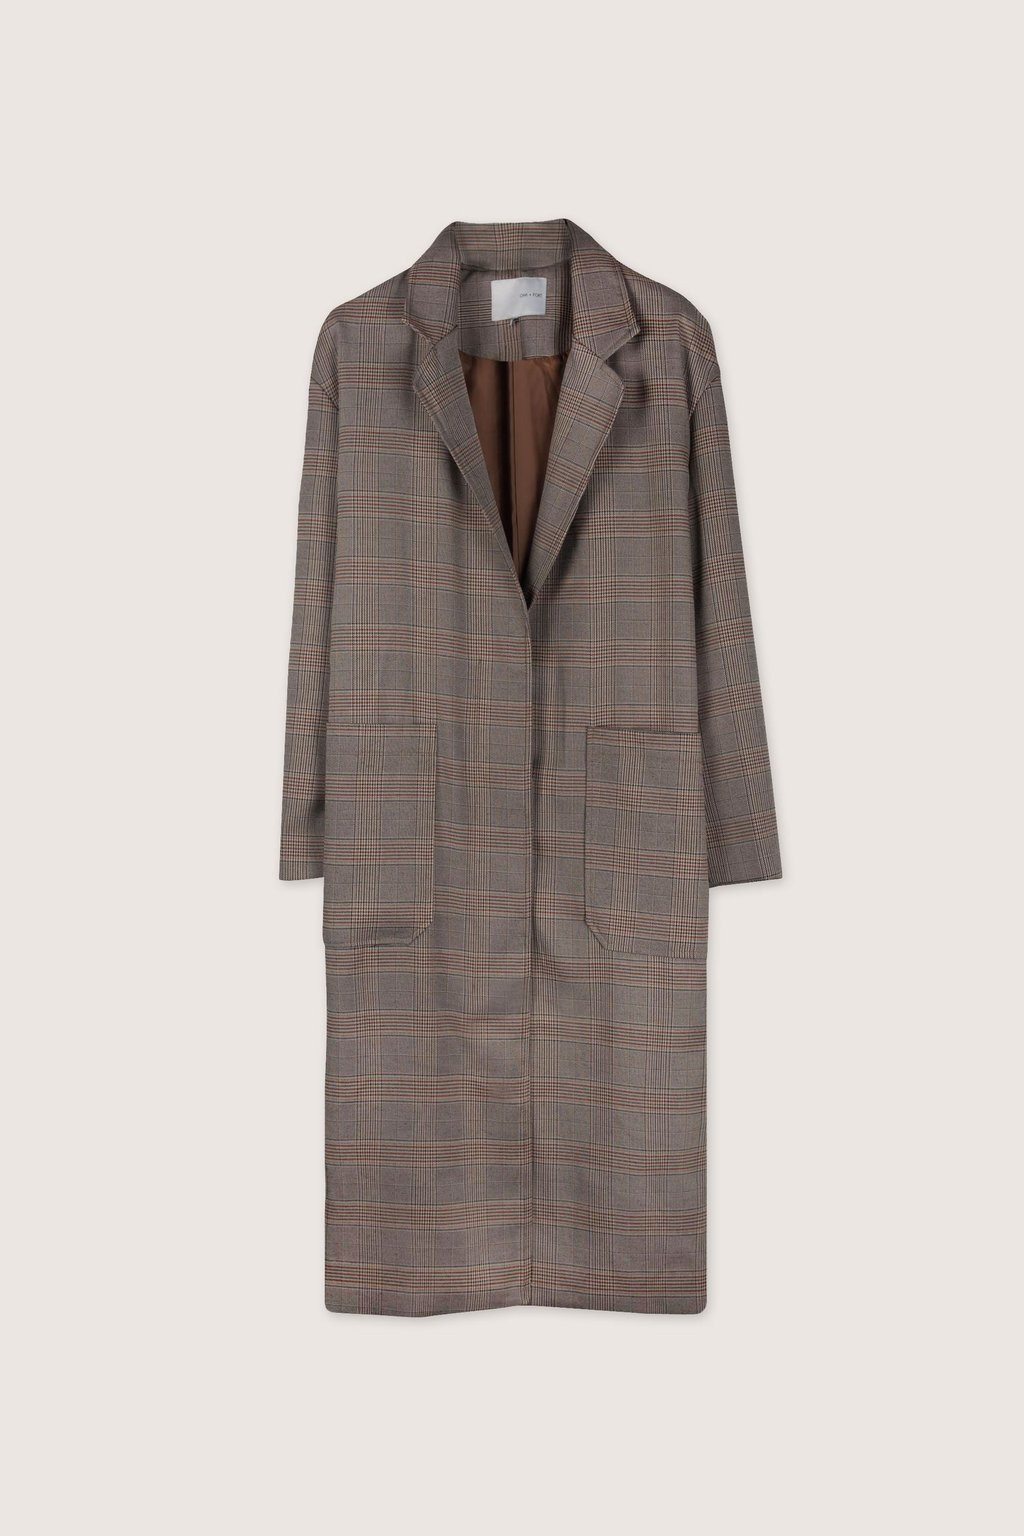 Coat H036 Beige 8